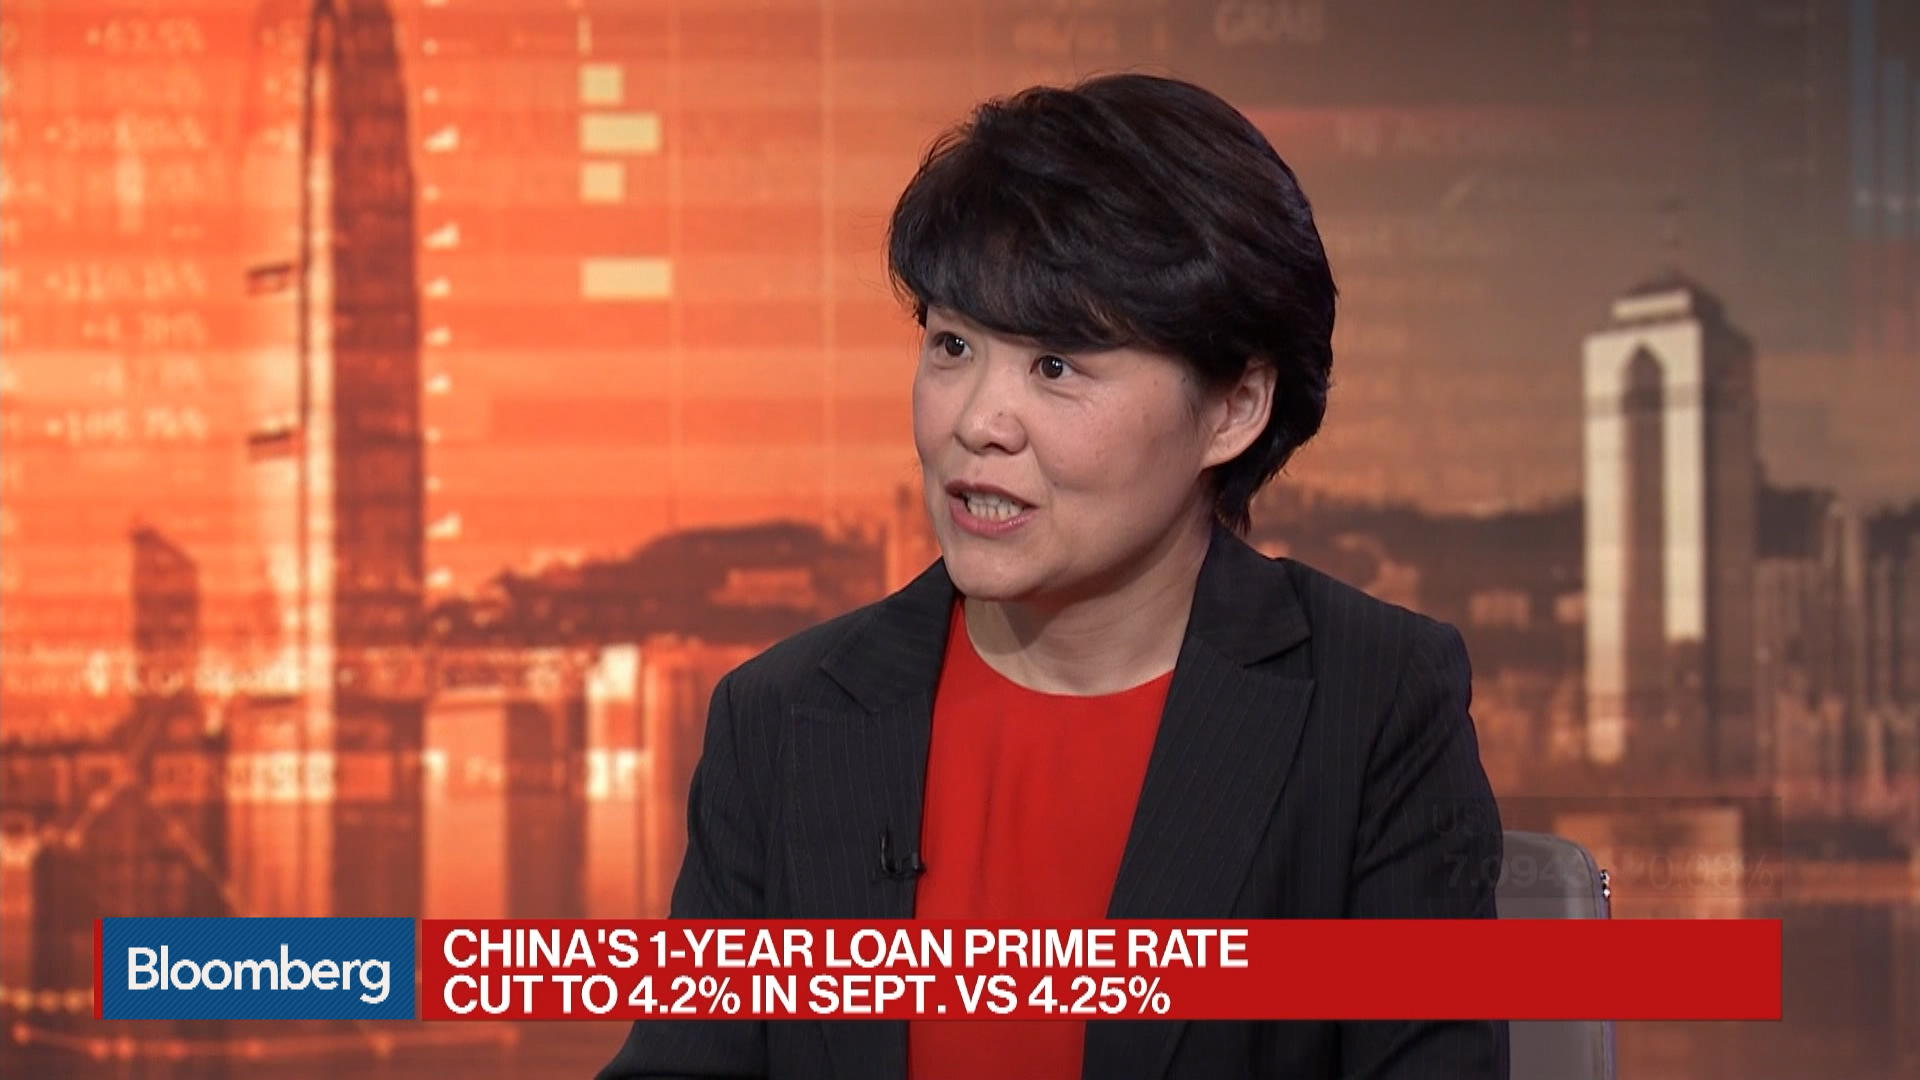 CCB International Managing Director and Head of Macro Research Cui Li on China's Loan Prime Rate Cut